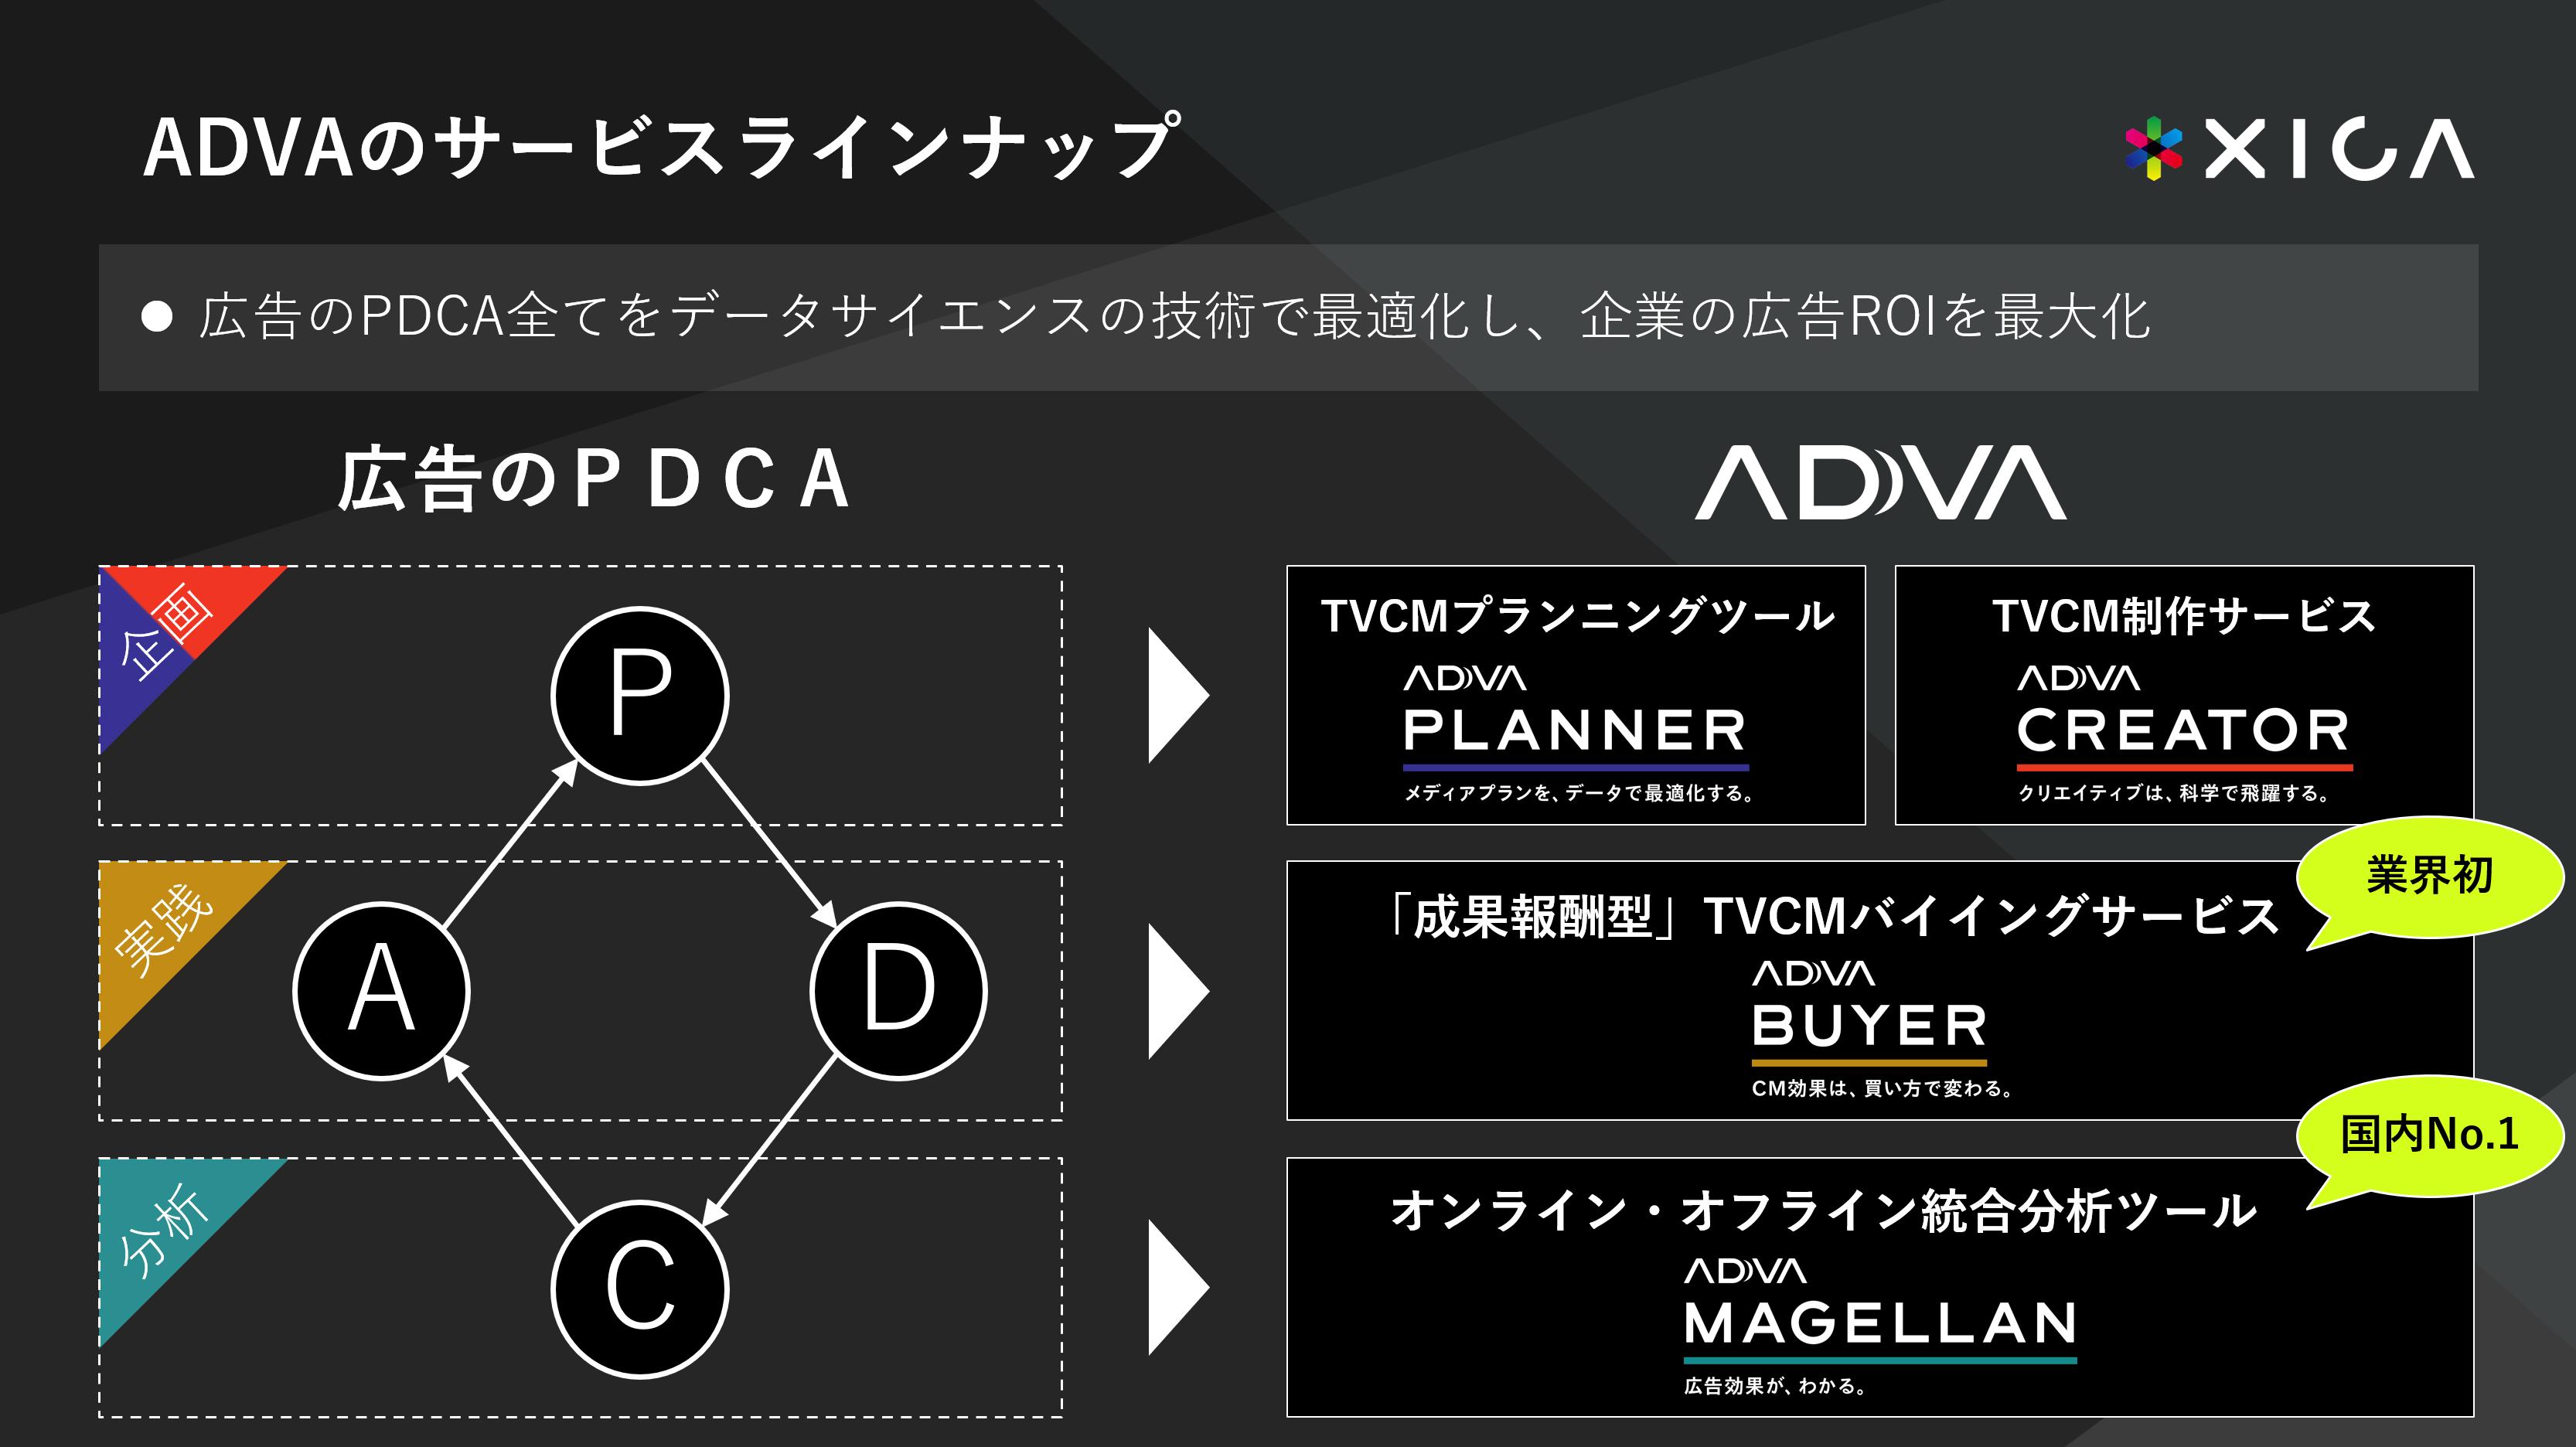 ADVAのサービスラインナップ